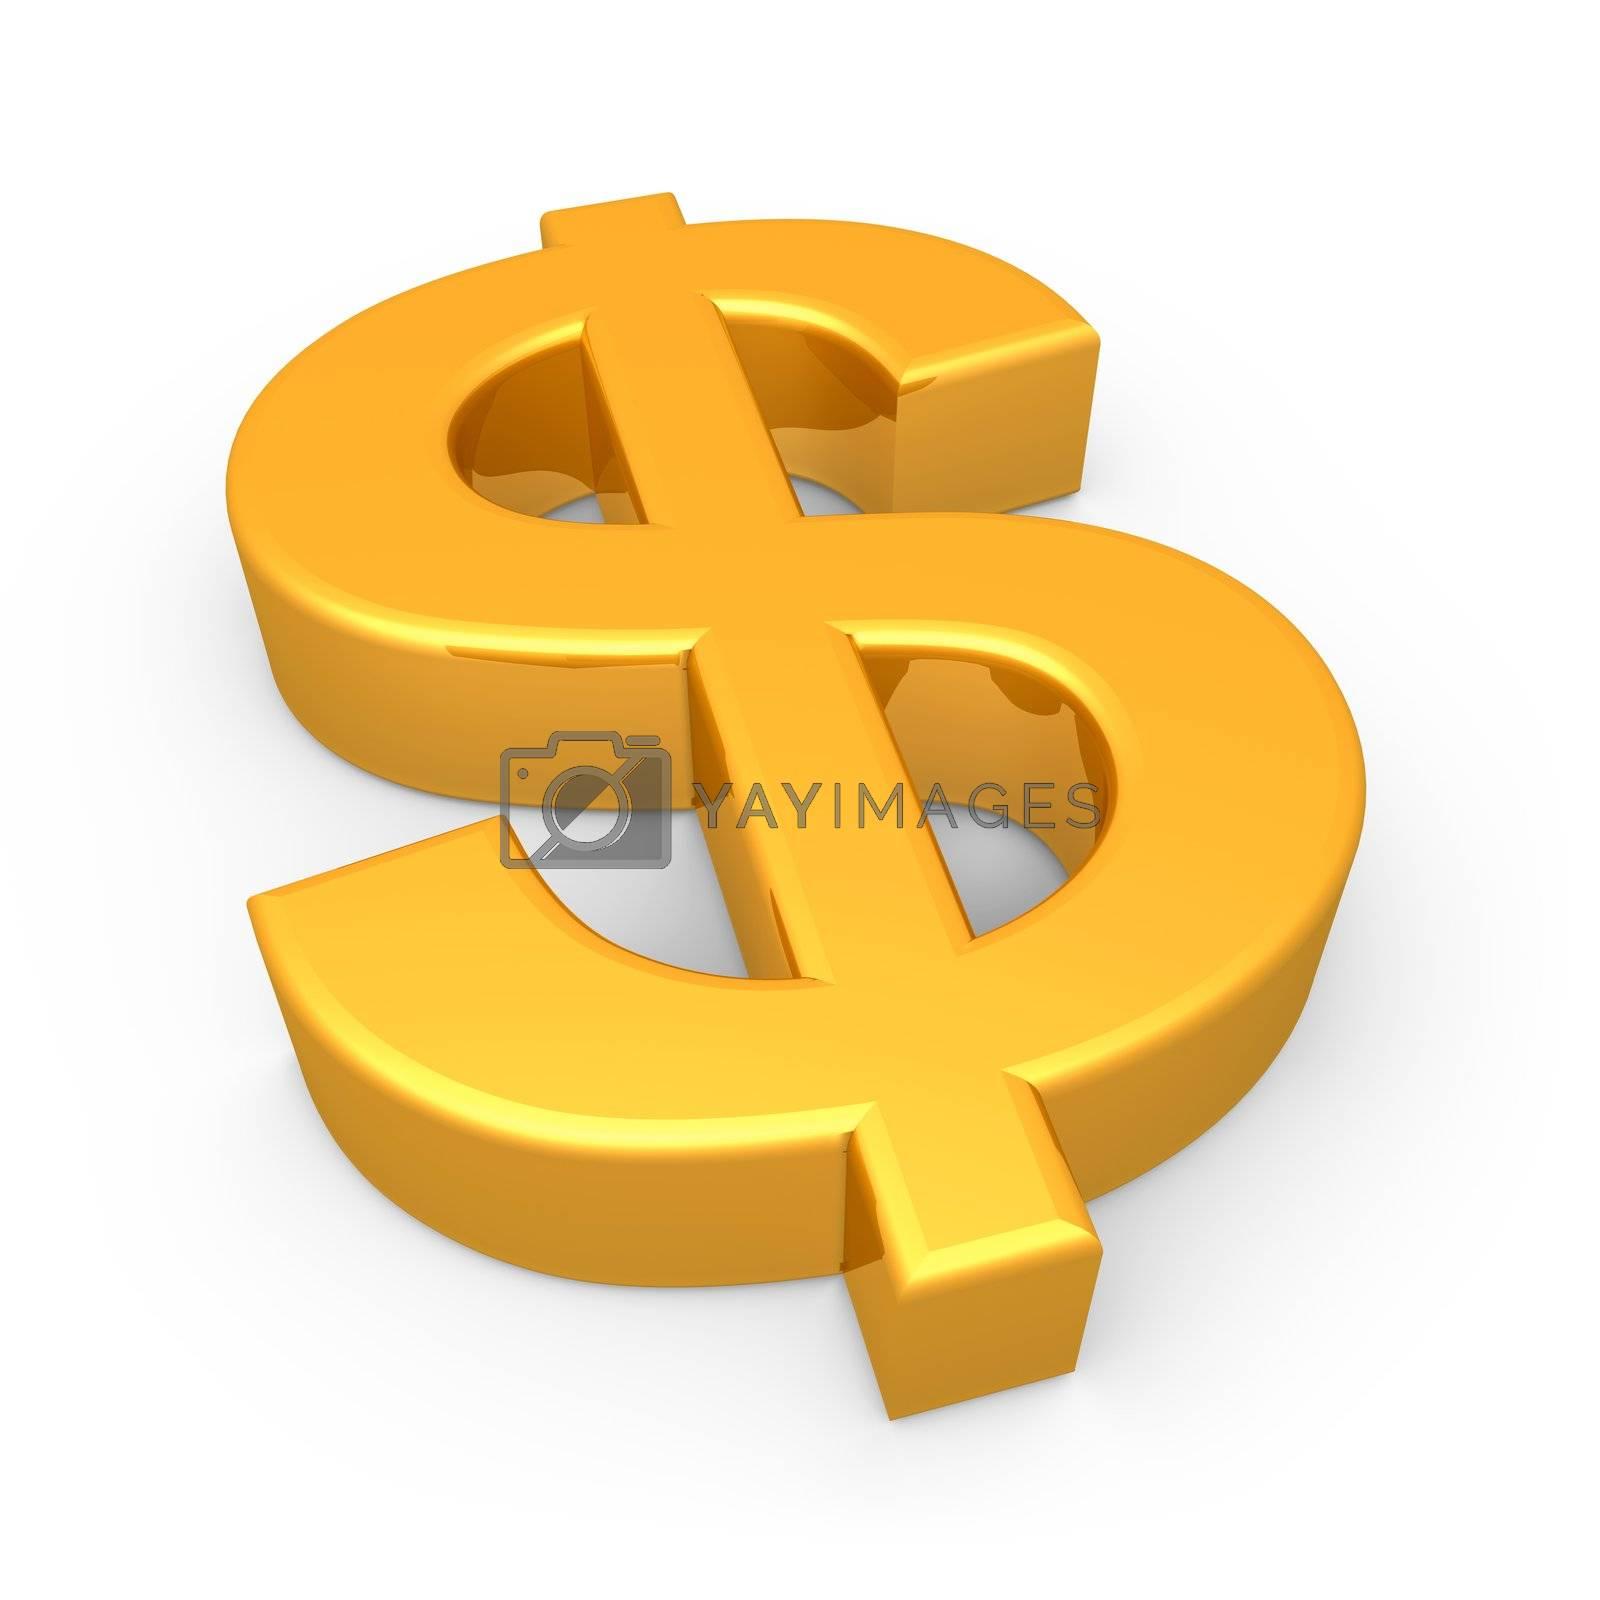 Computer Generated Image - Dollar Symbol .